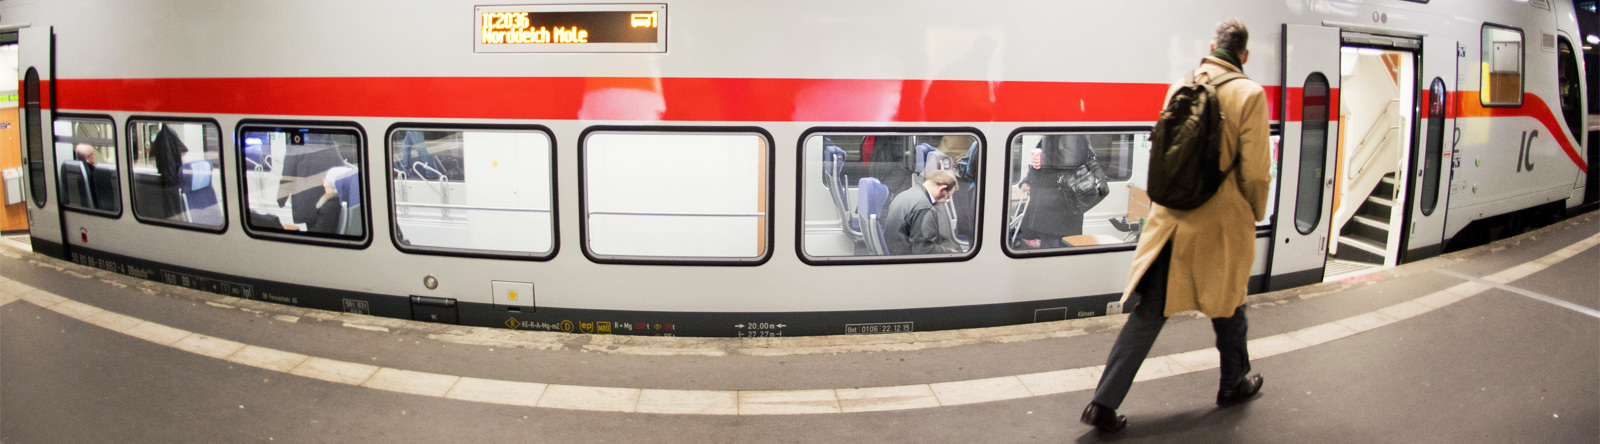 Doppelstock IC mit Fahrgästen